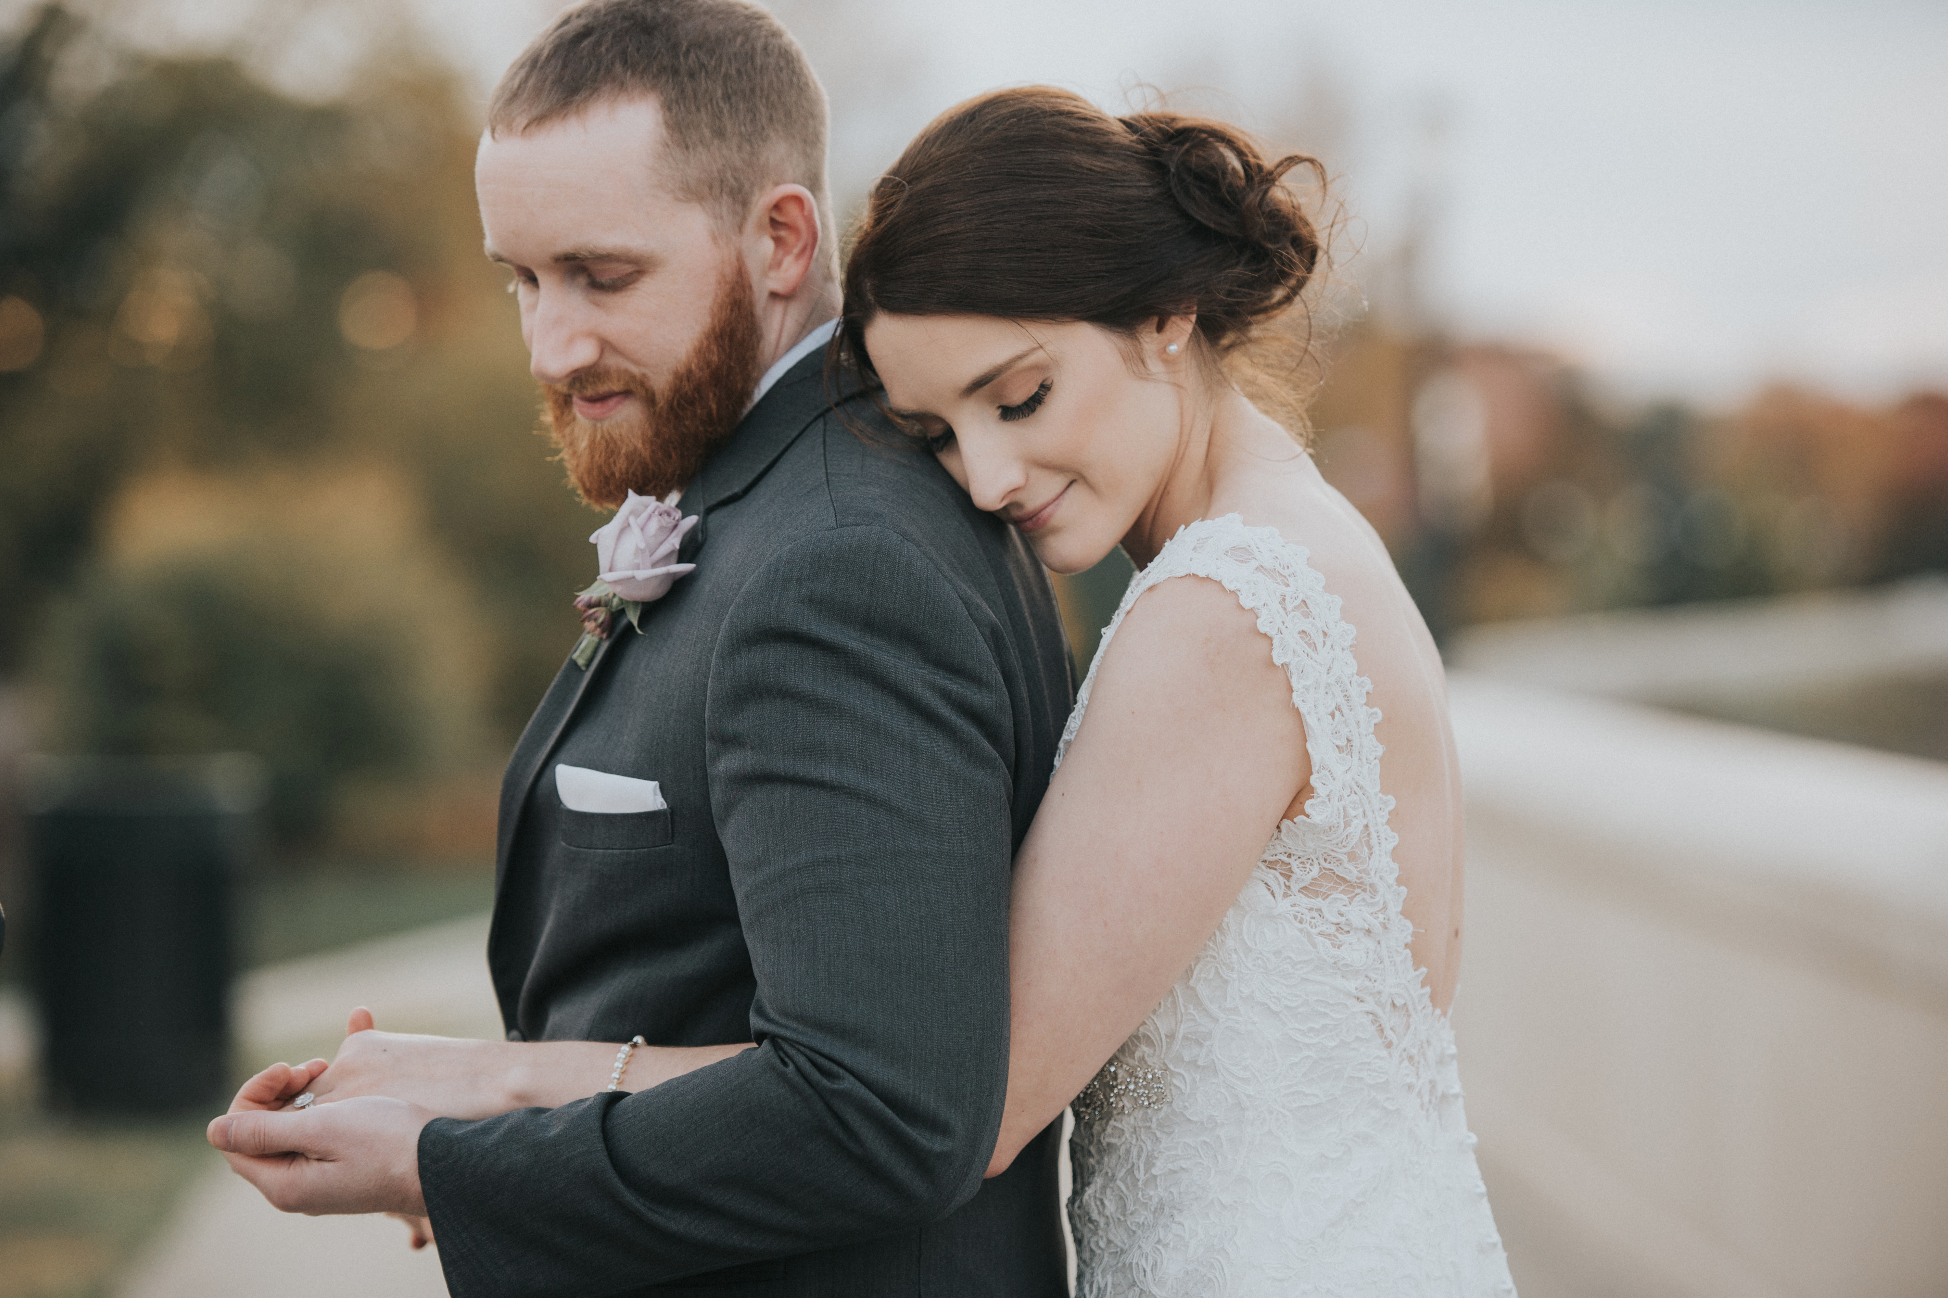 Beloved Wedding Photography